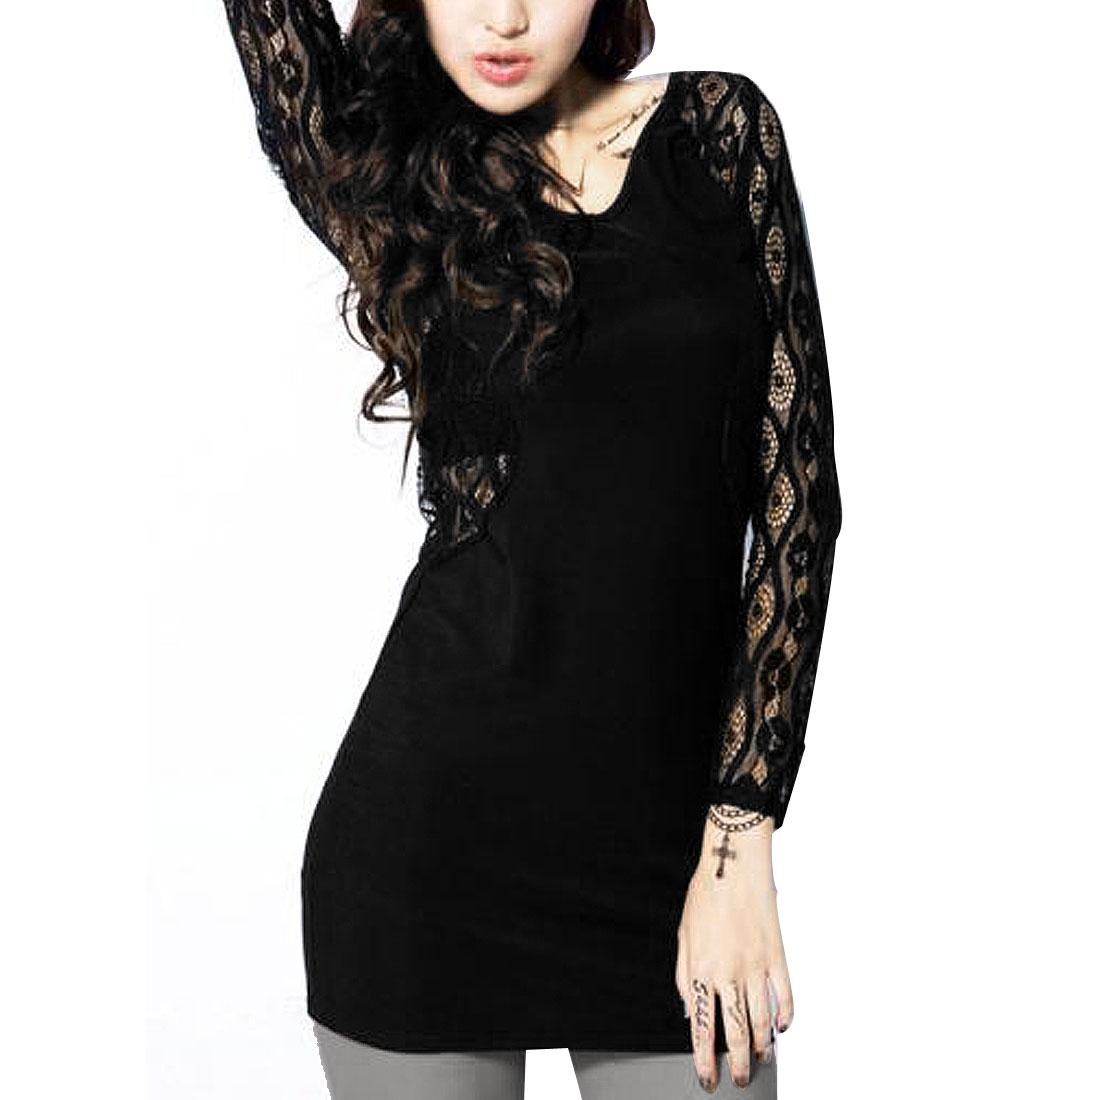 XS Women Black U Neck Long lace Sleeve Blouses